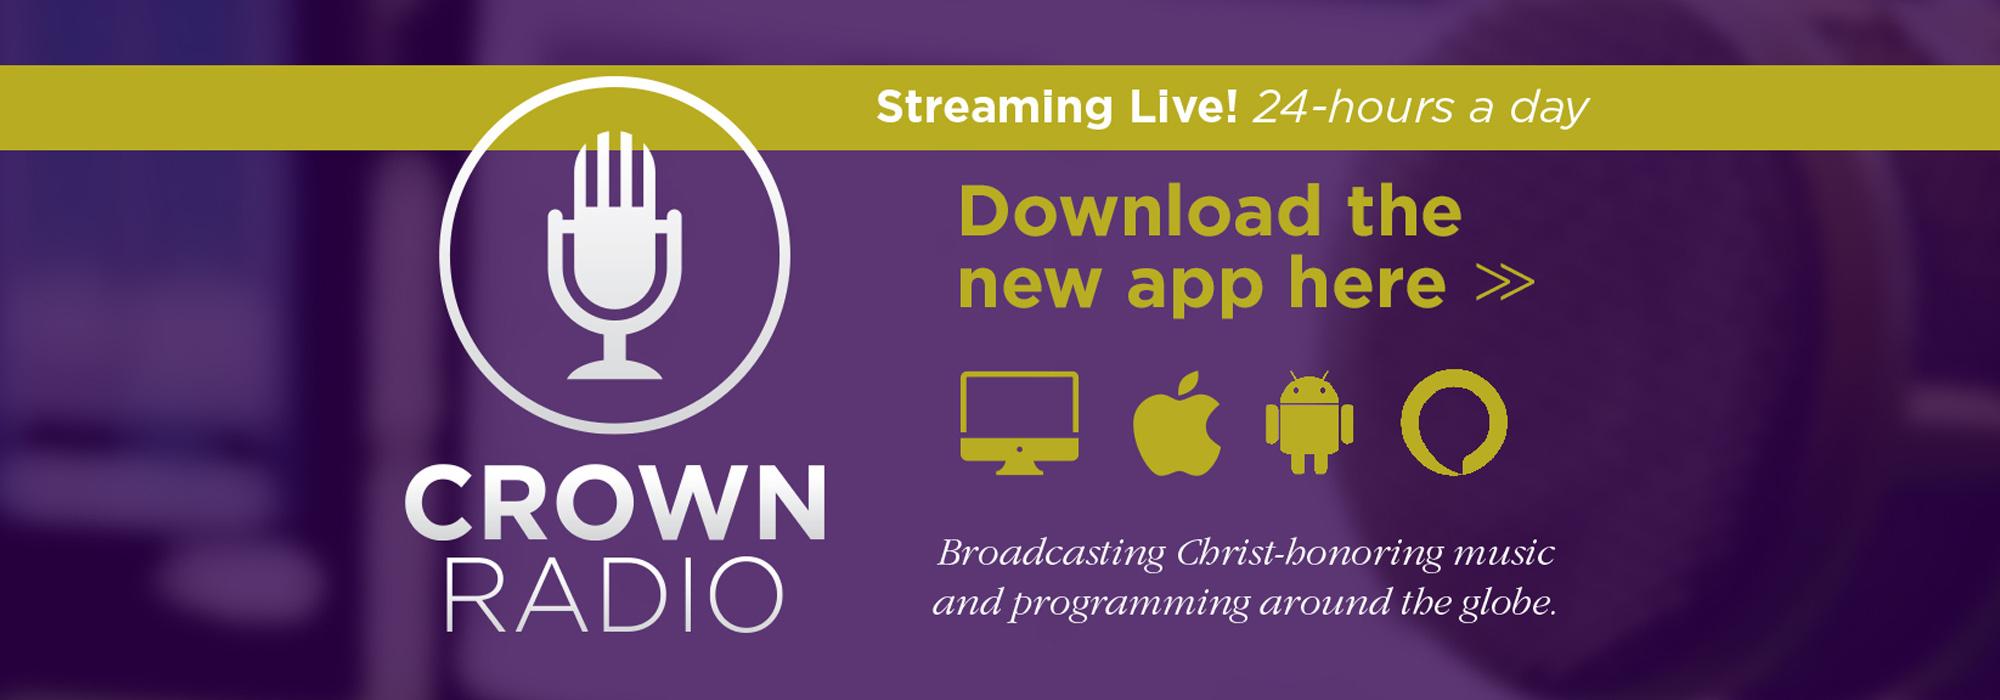 Crown Radio